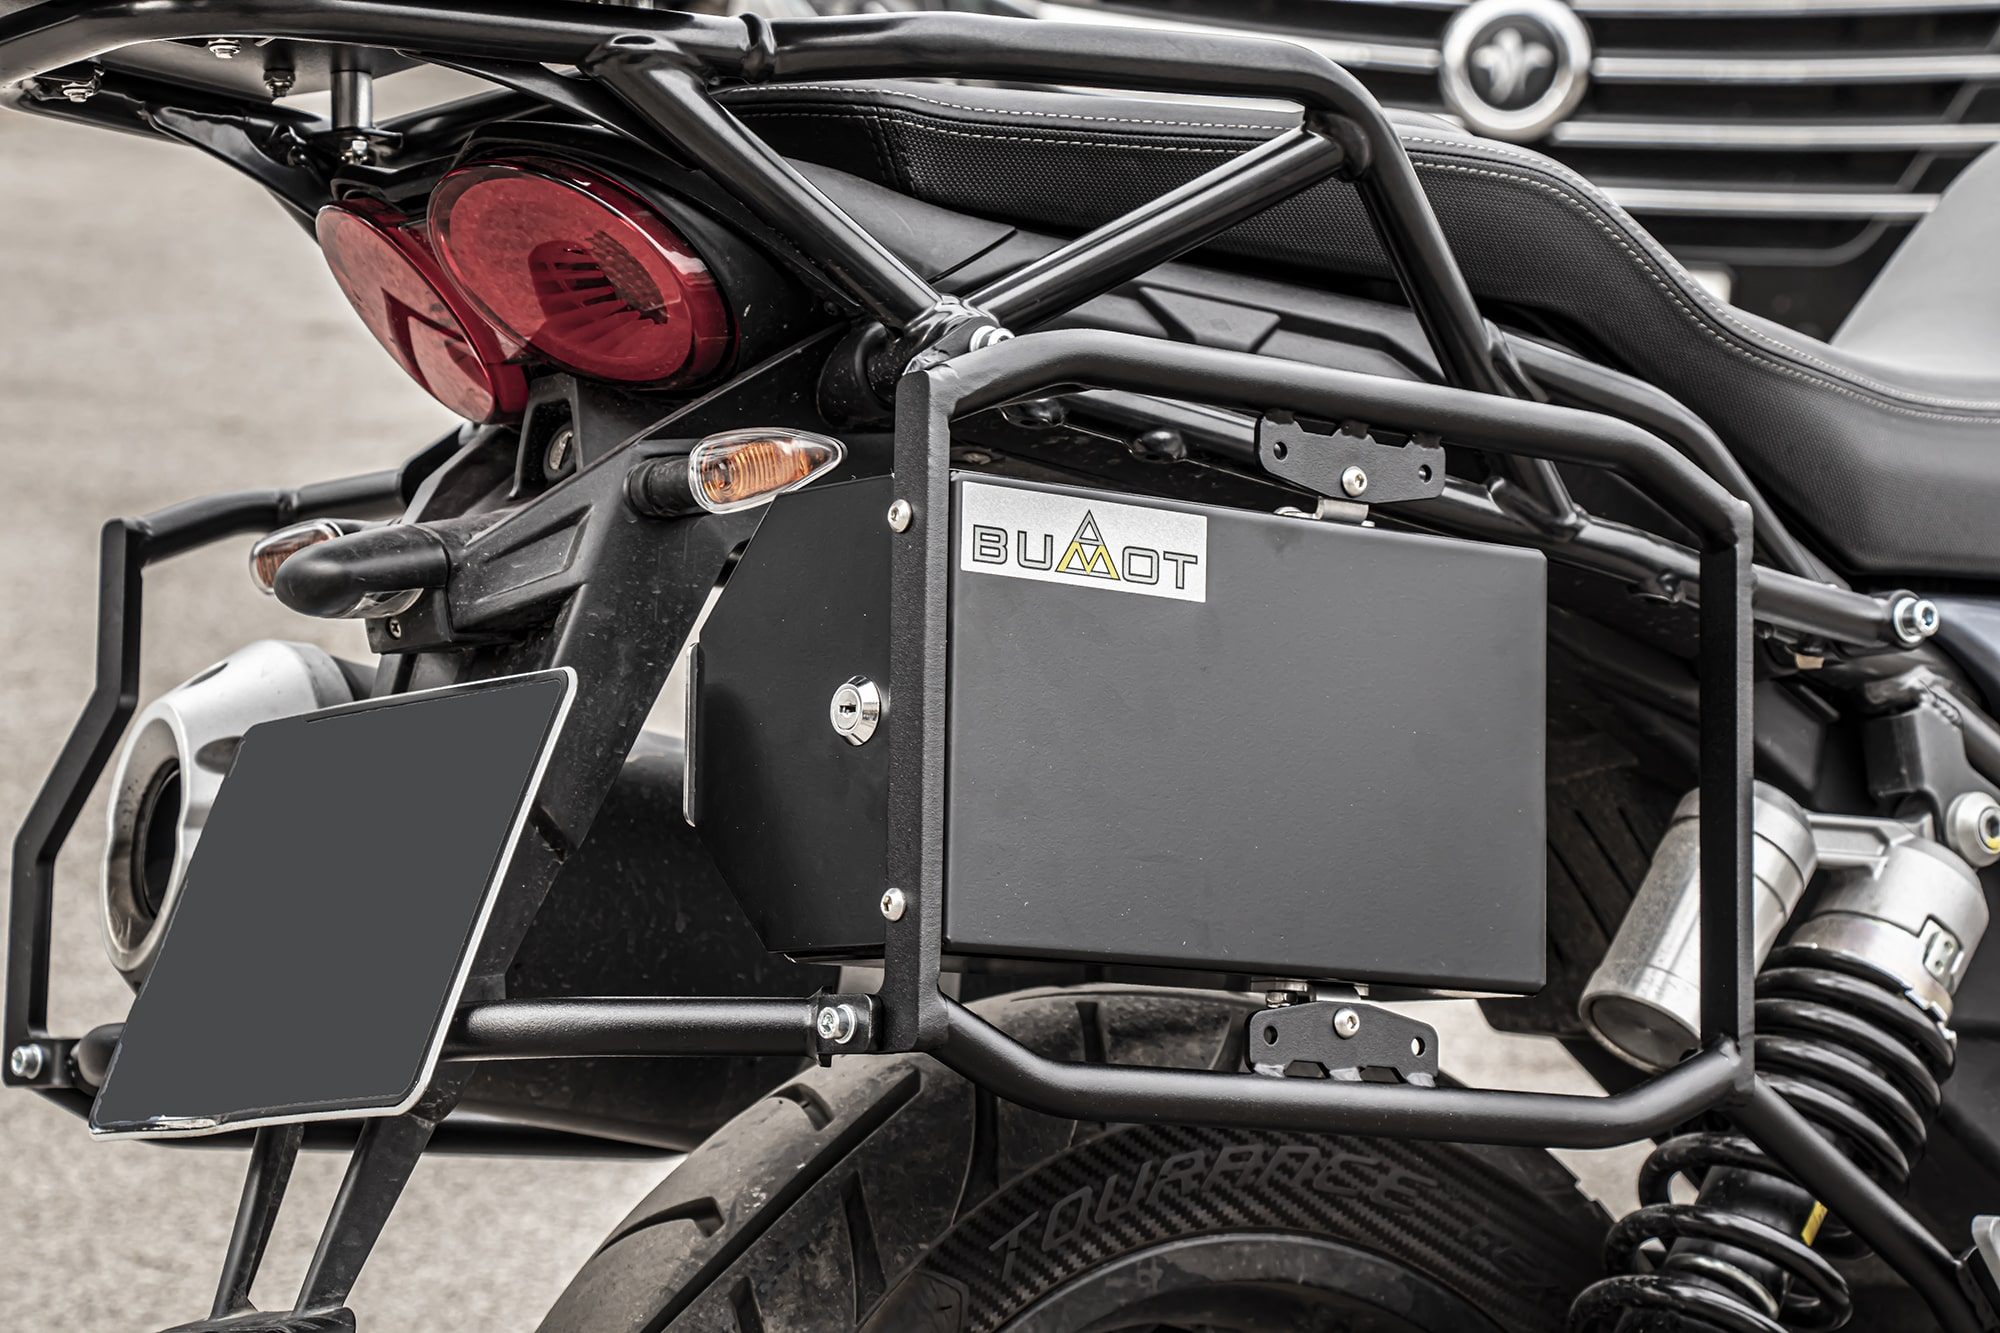 Pannier racks V85TT